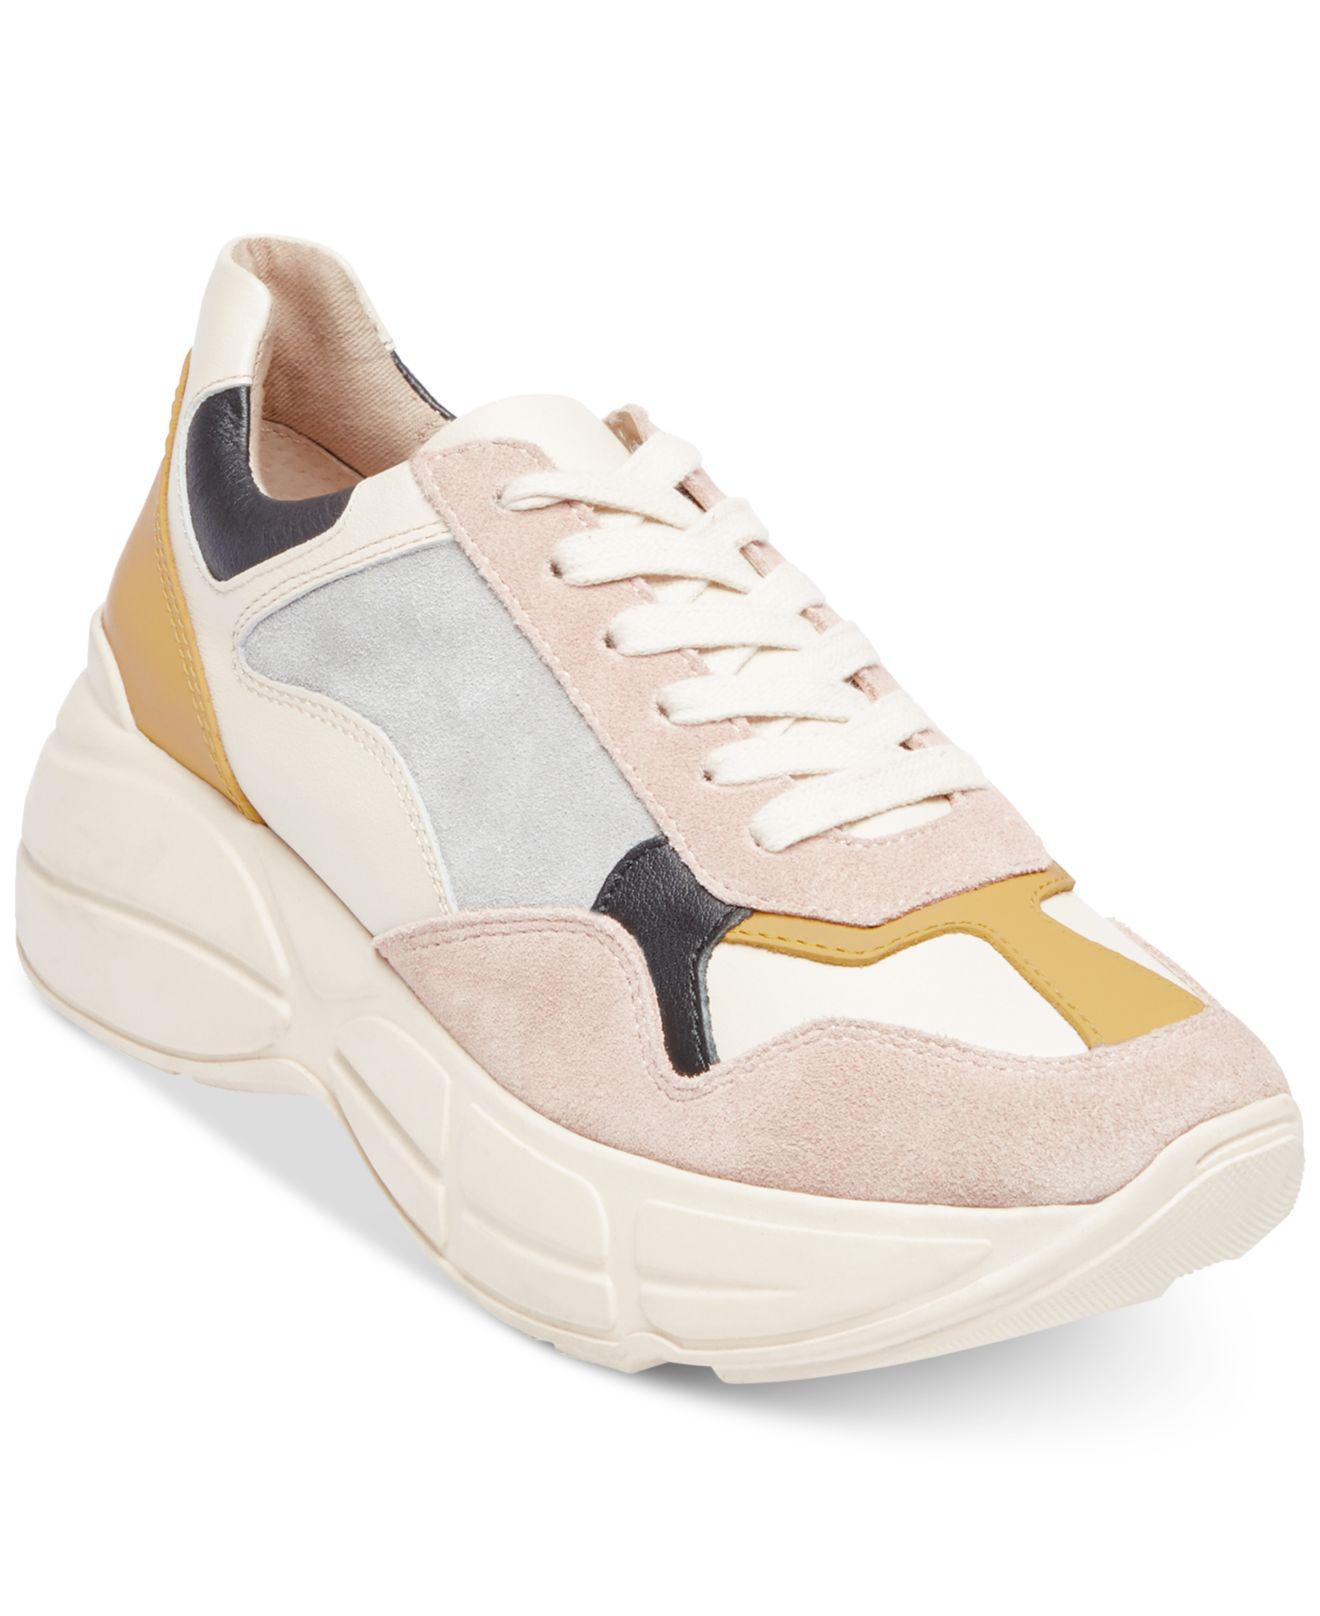 0b5b374a2a7 Steve Madden. Women s Memory Chunky Sneakers